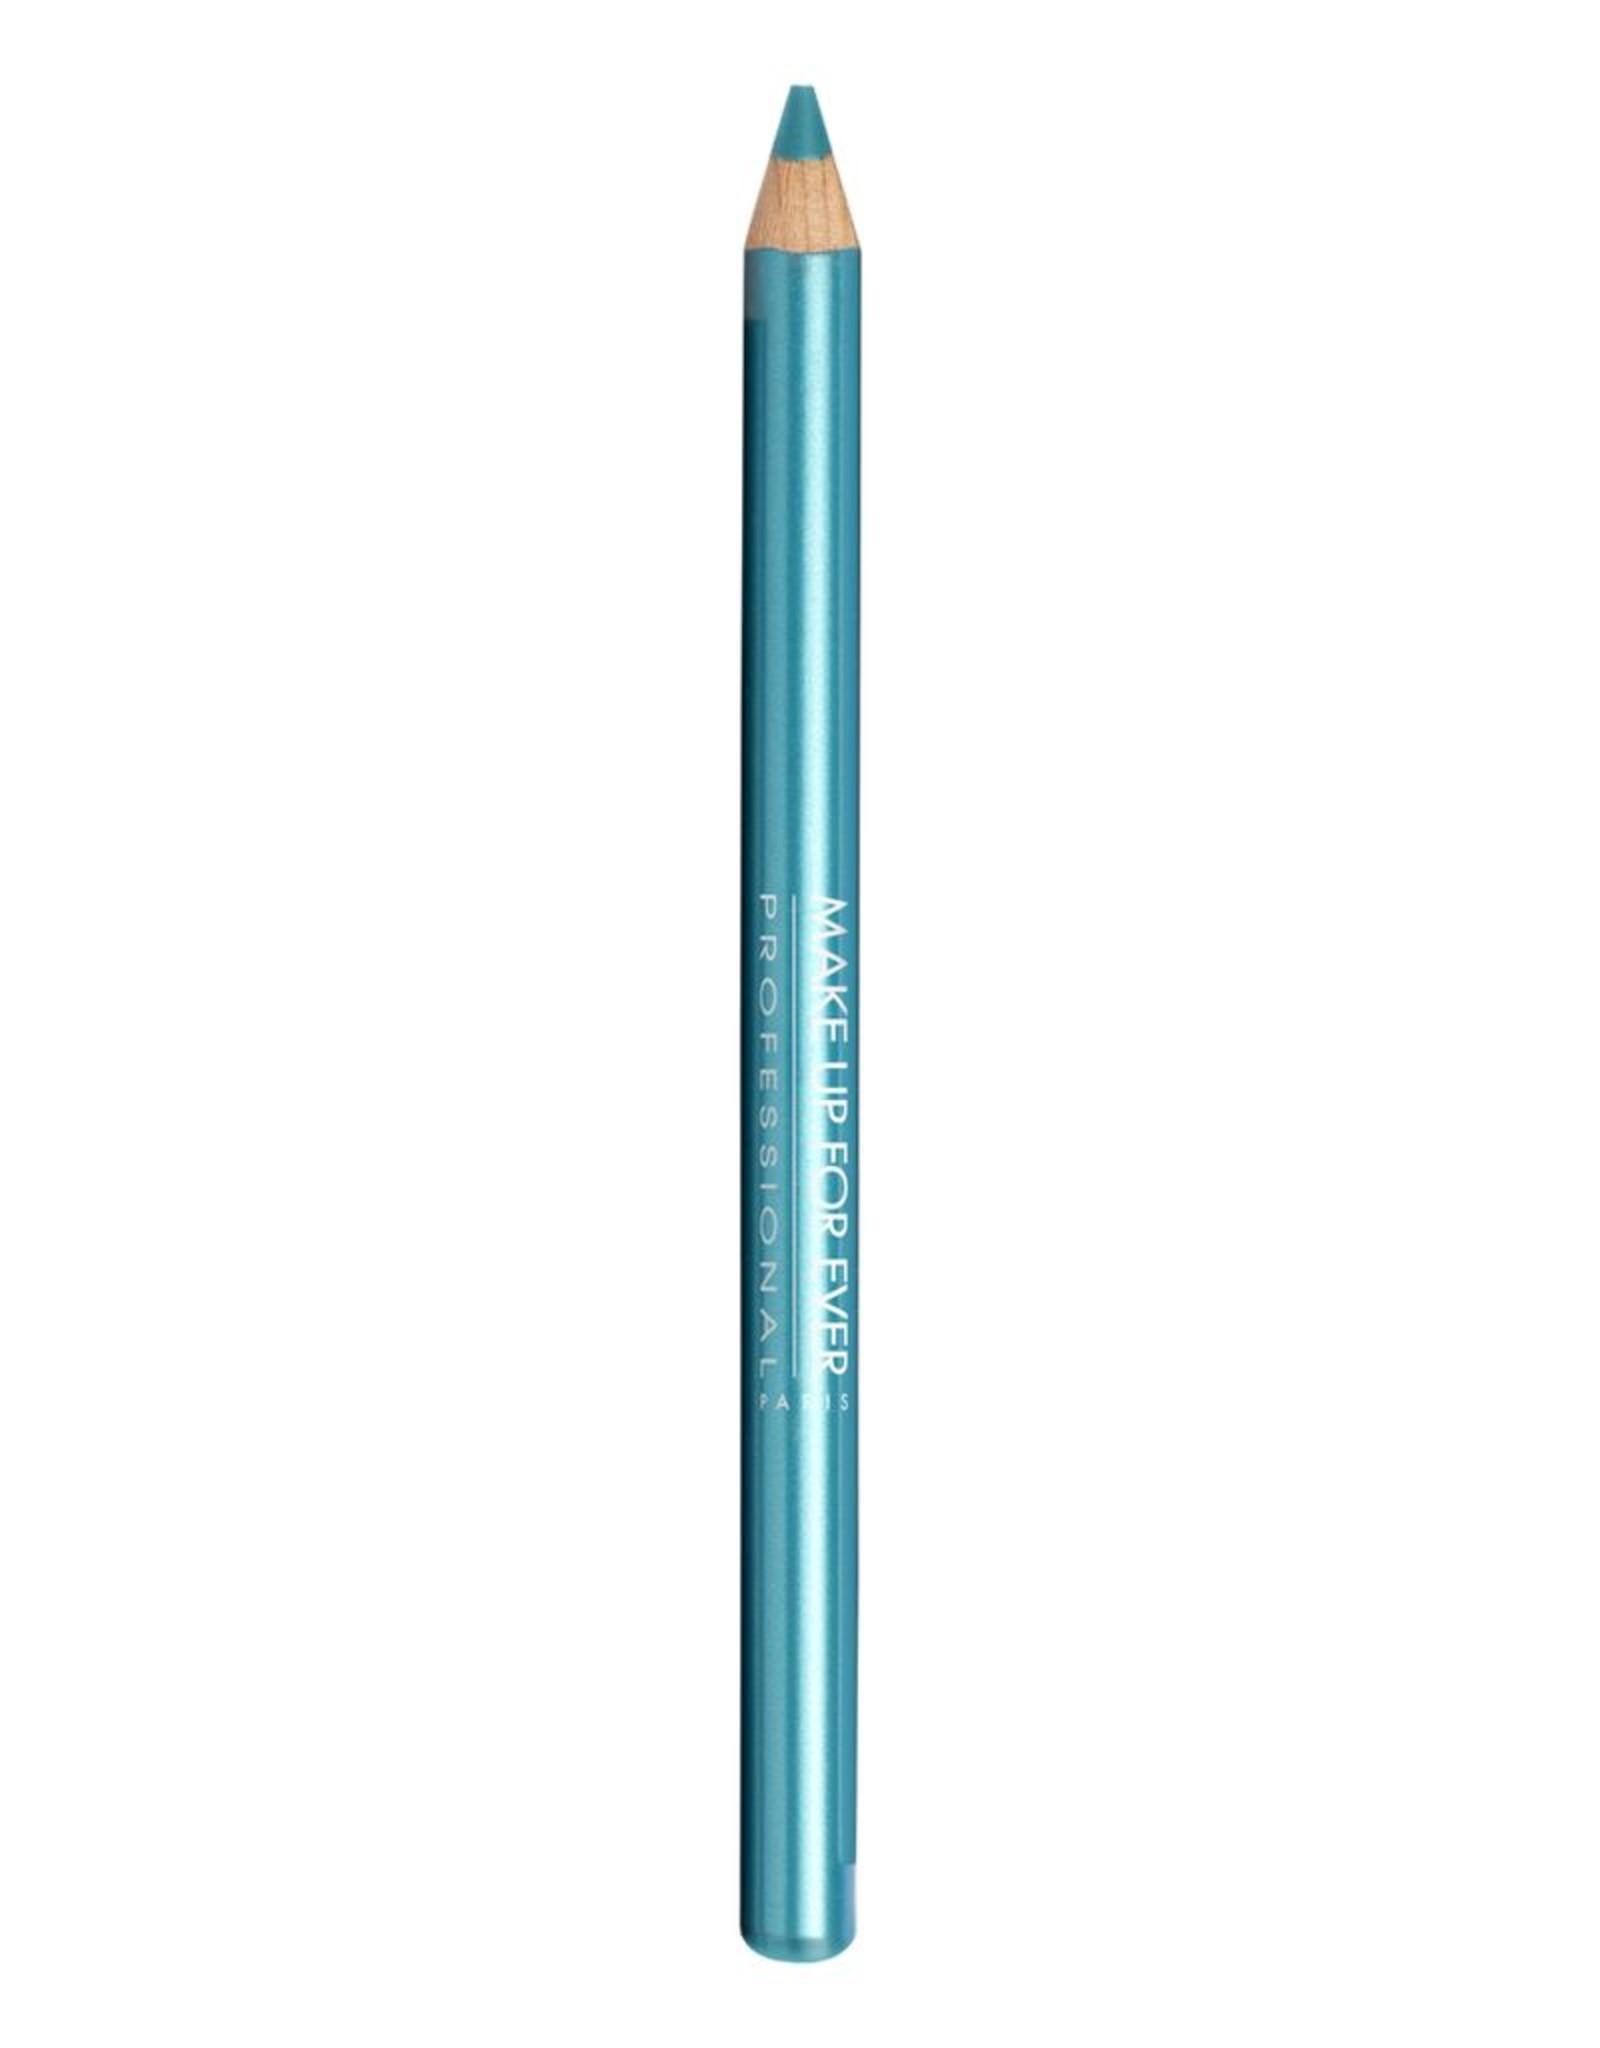 MUFE CRAYON KHOL 1,14g3K - turquoise nacre / pearly turquoise